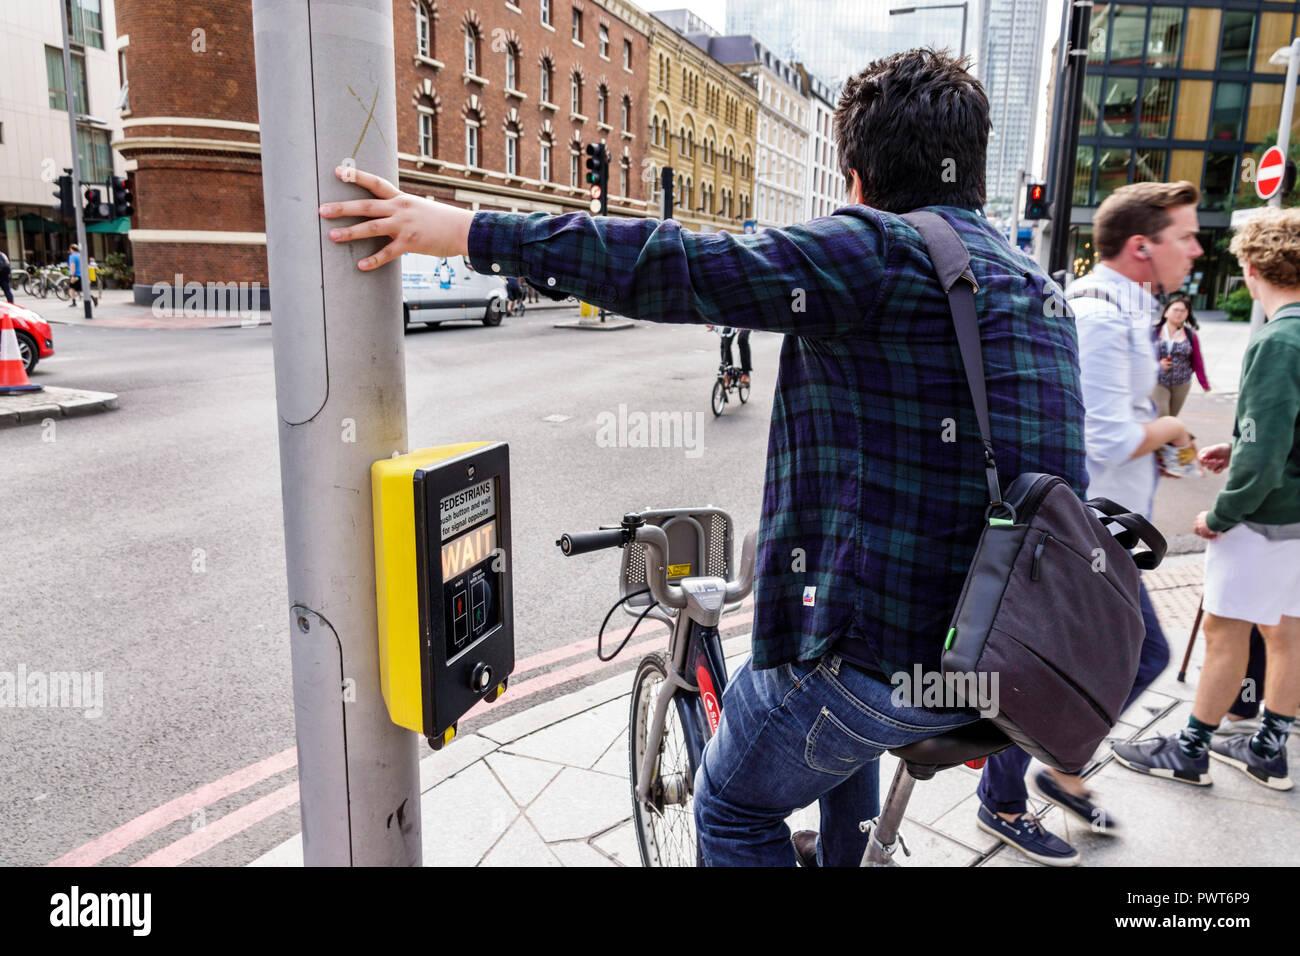 London England United Kingdom Great Britain Southwark street pedestrian crossing crosswalk signal activation box cyclist bicycle man rider waiting tra - Stock Image